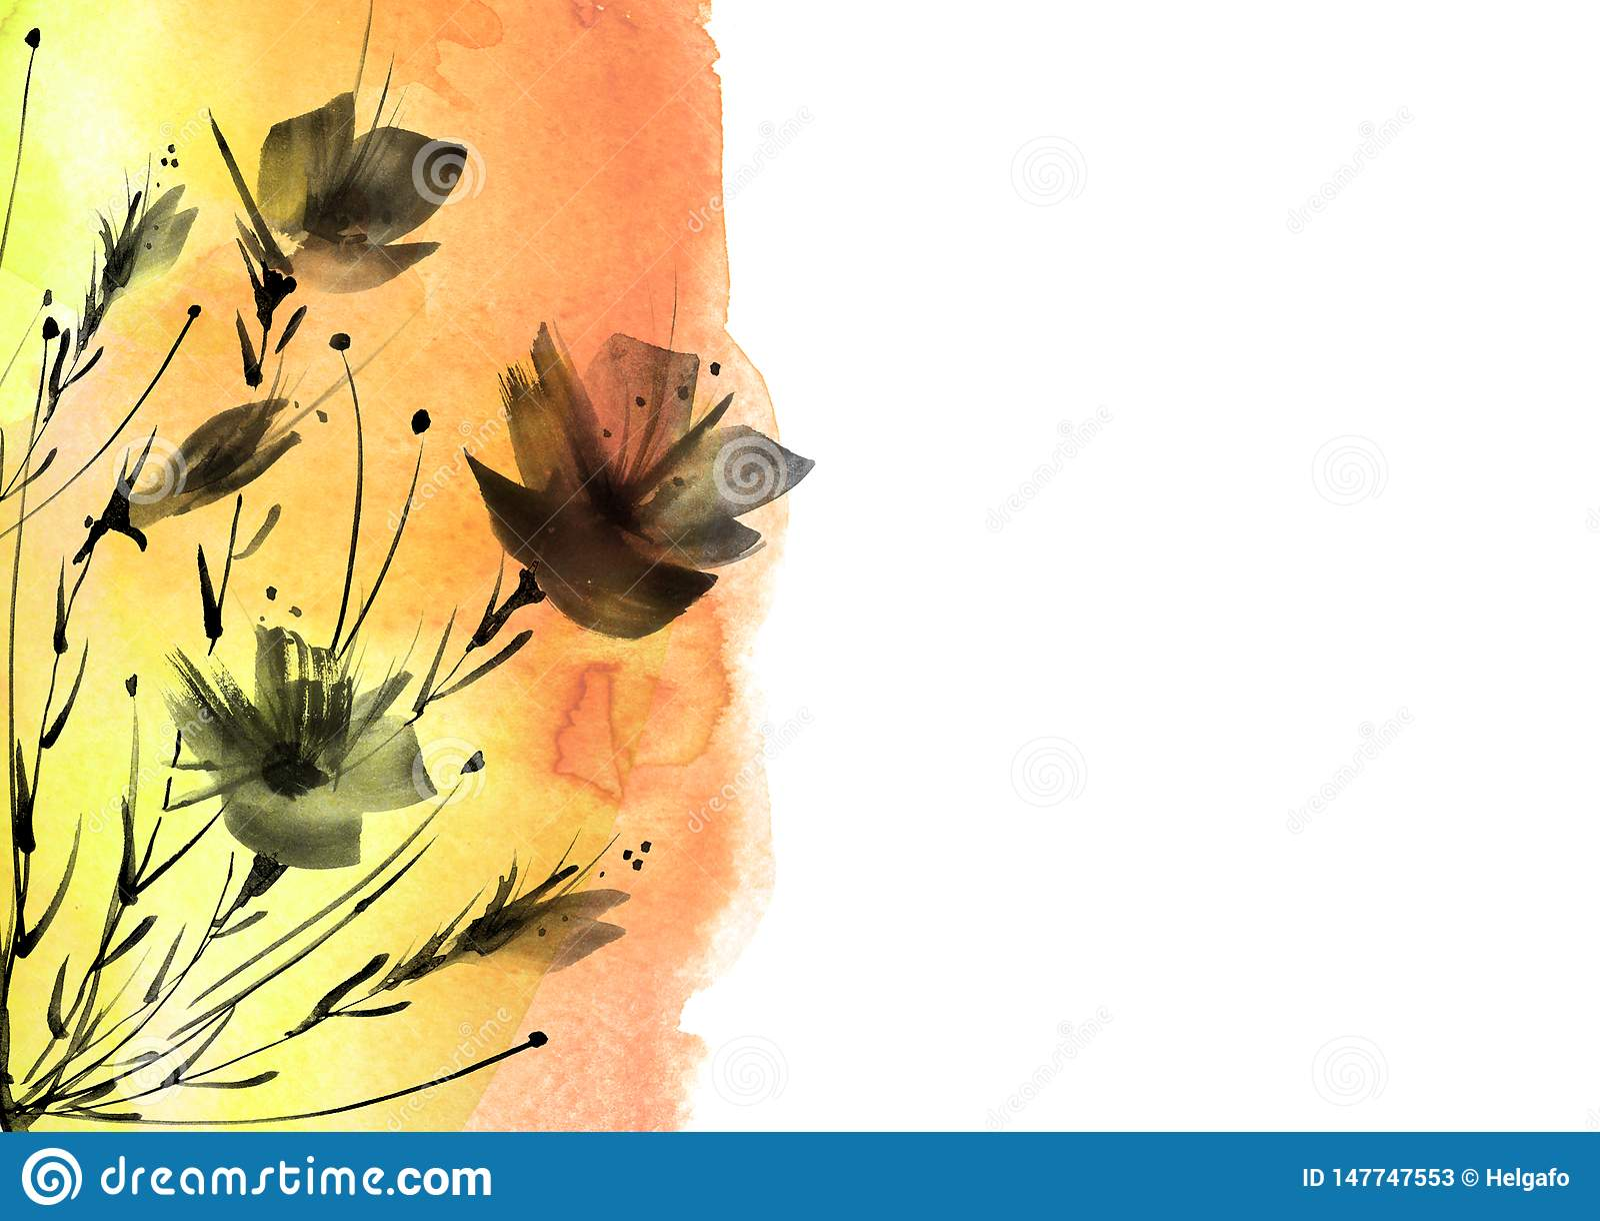 E Μια ανθοδέσμη των μαύρων λουλουδιών σκιαγραφιών των παπαρουνών, wildflowers σε ένα απομονωμένο λευκό υπόβαθρο Watercolor floral